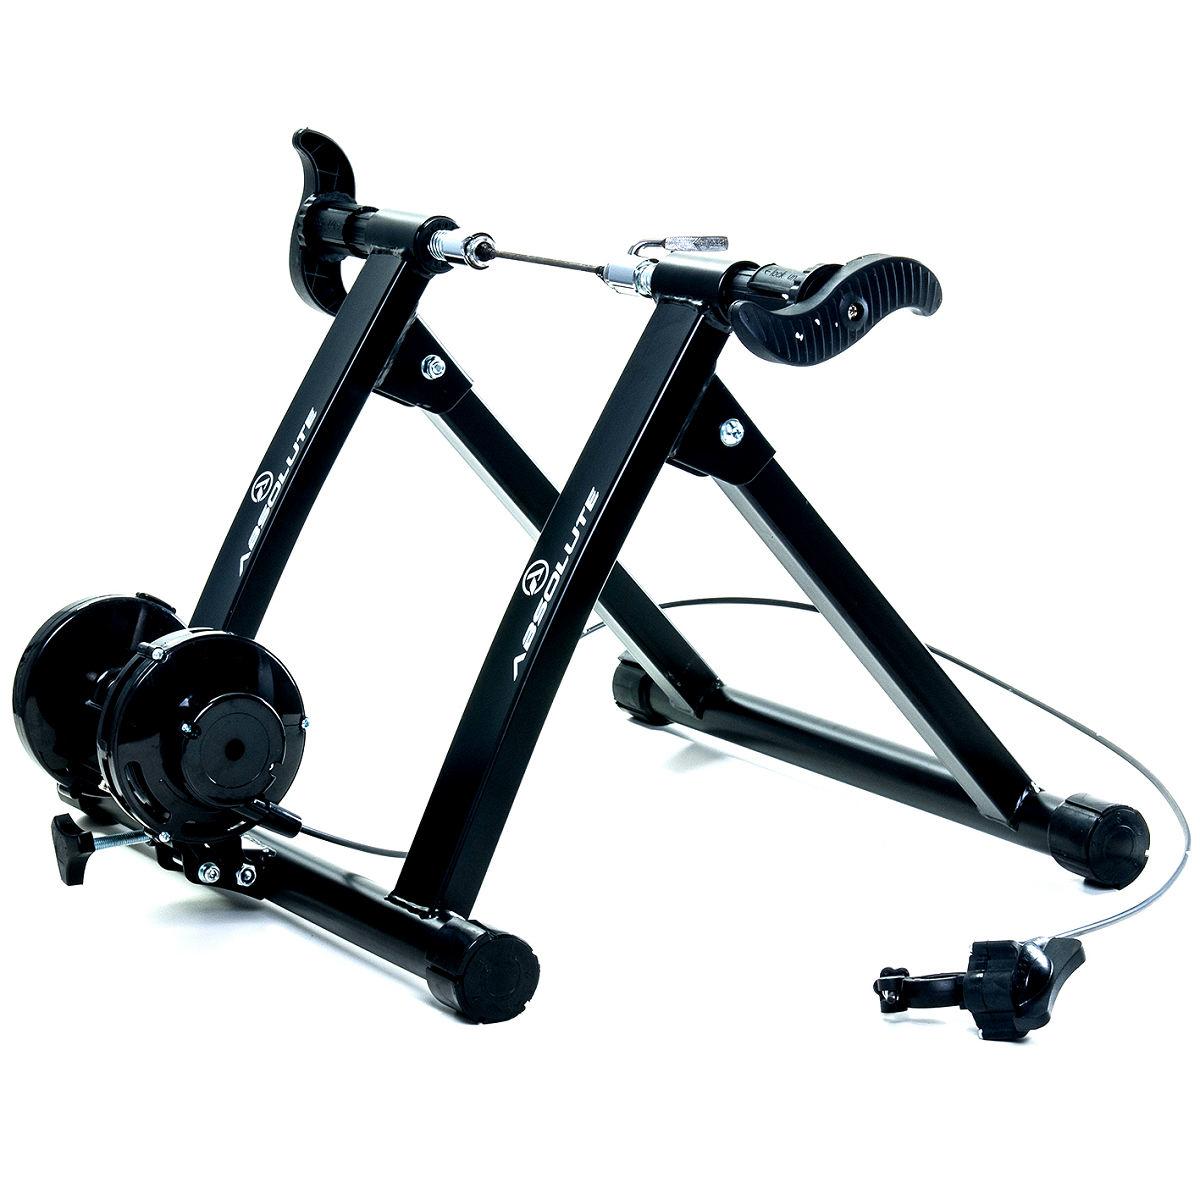 Rolo De Treino Treinamento Absolute Wild 5 Ciclismo Bike